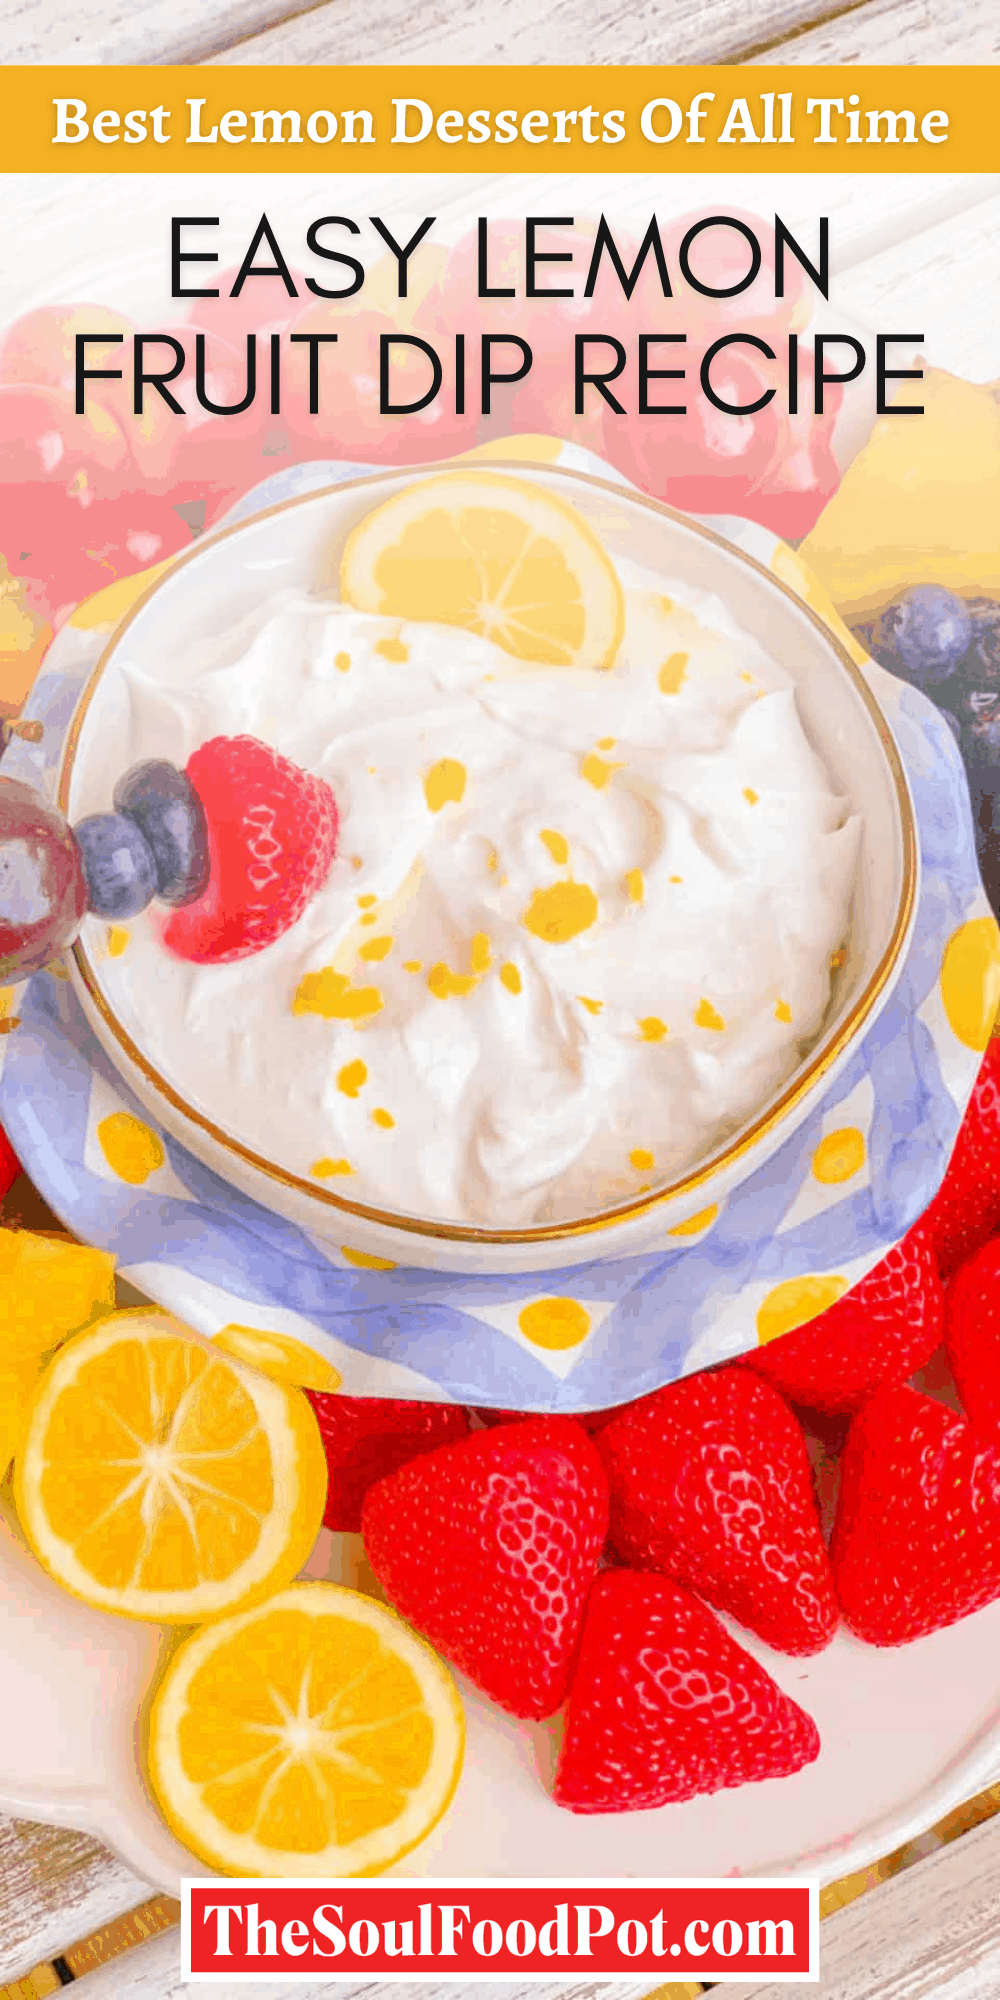 Lemon Fruit Dip With Cream Cheese Recipe Instructions